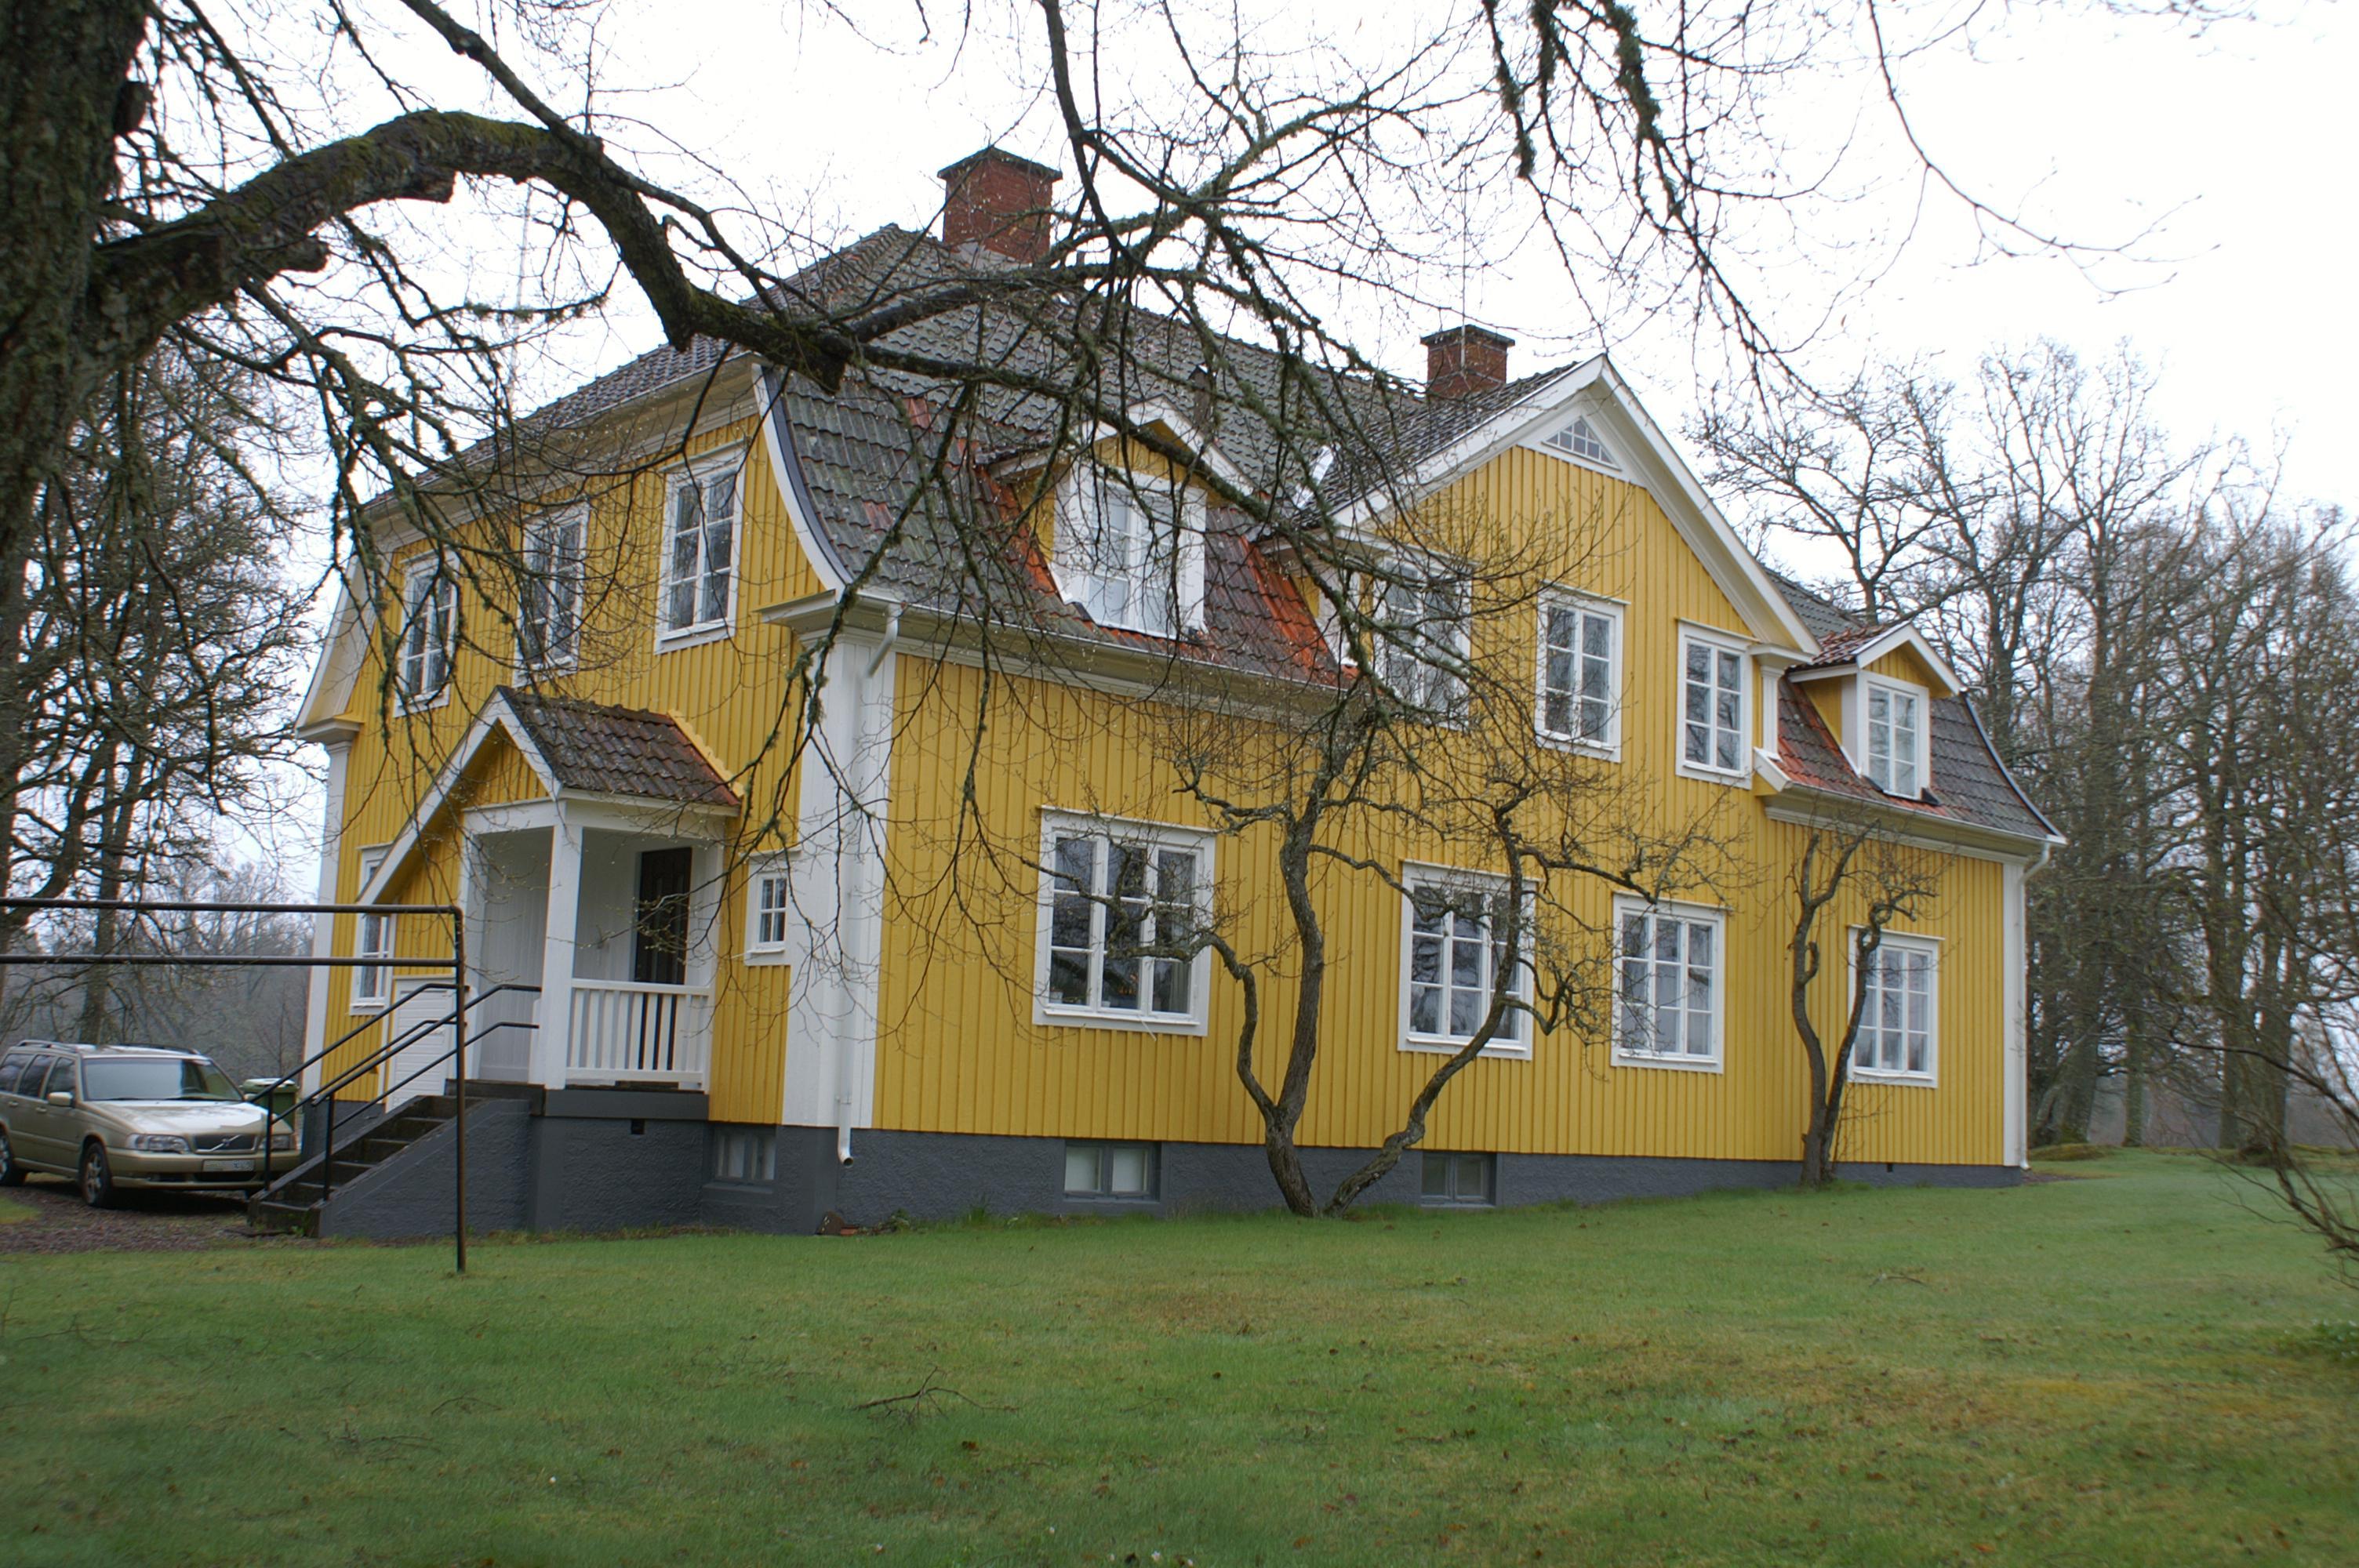 Fil:Hlleberga church Nybro unam.net Wikipedia